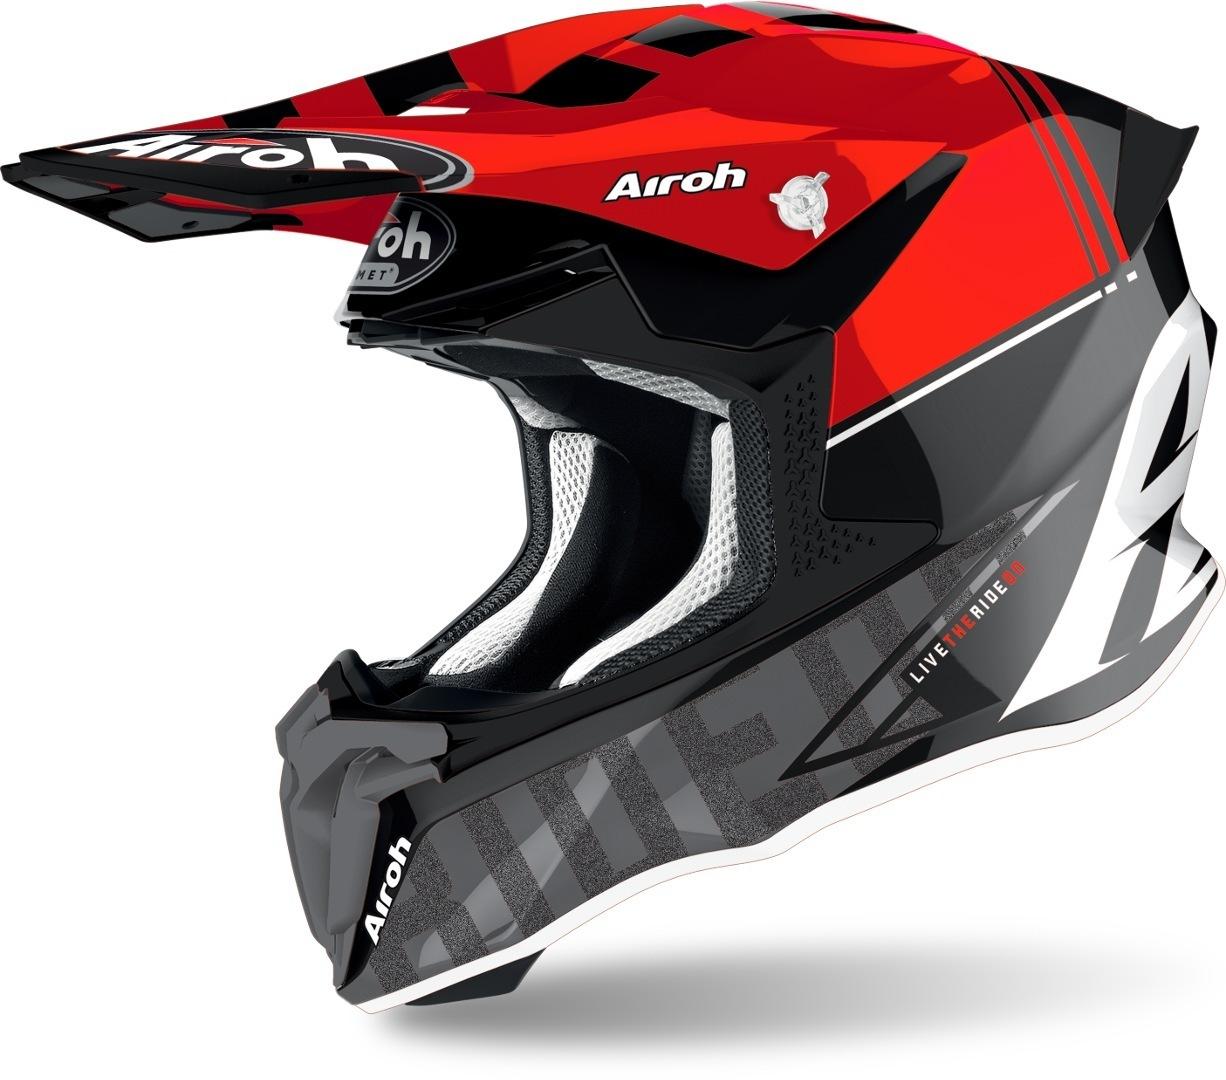 Airoh Twist 2.0 Tech Motocross Helm, rot, Größe XS, rot, Größe XS